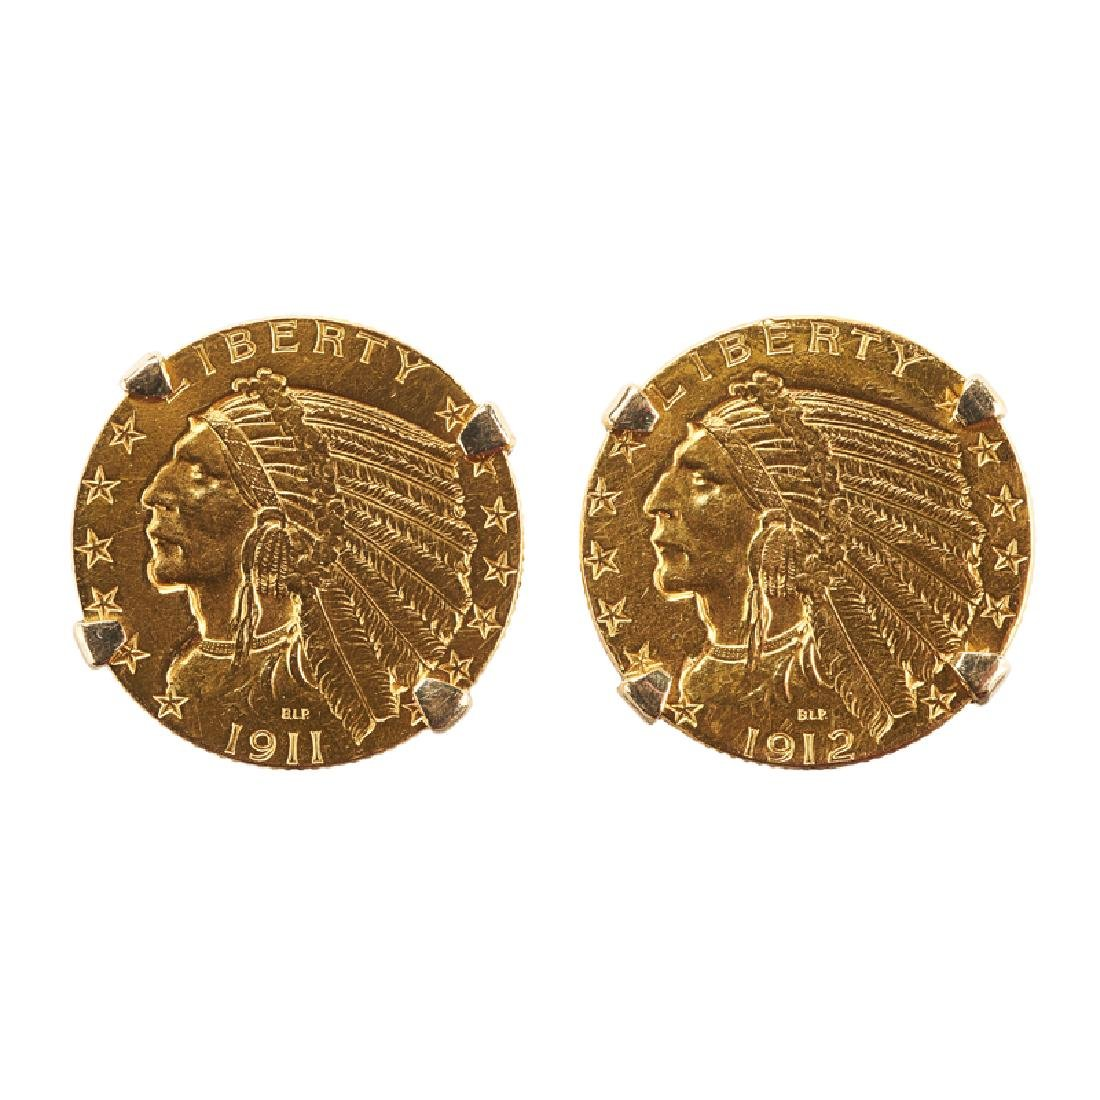 U.S. $5 LIBERTY YELLOW GOLD COIN CUFFLINKS